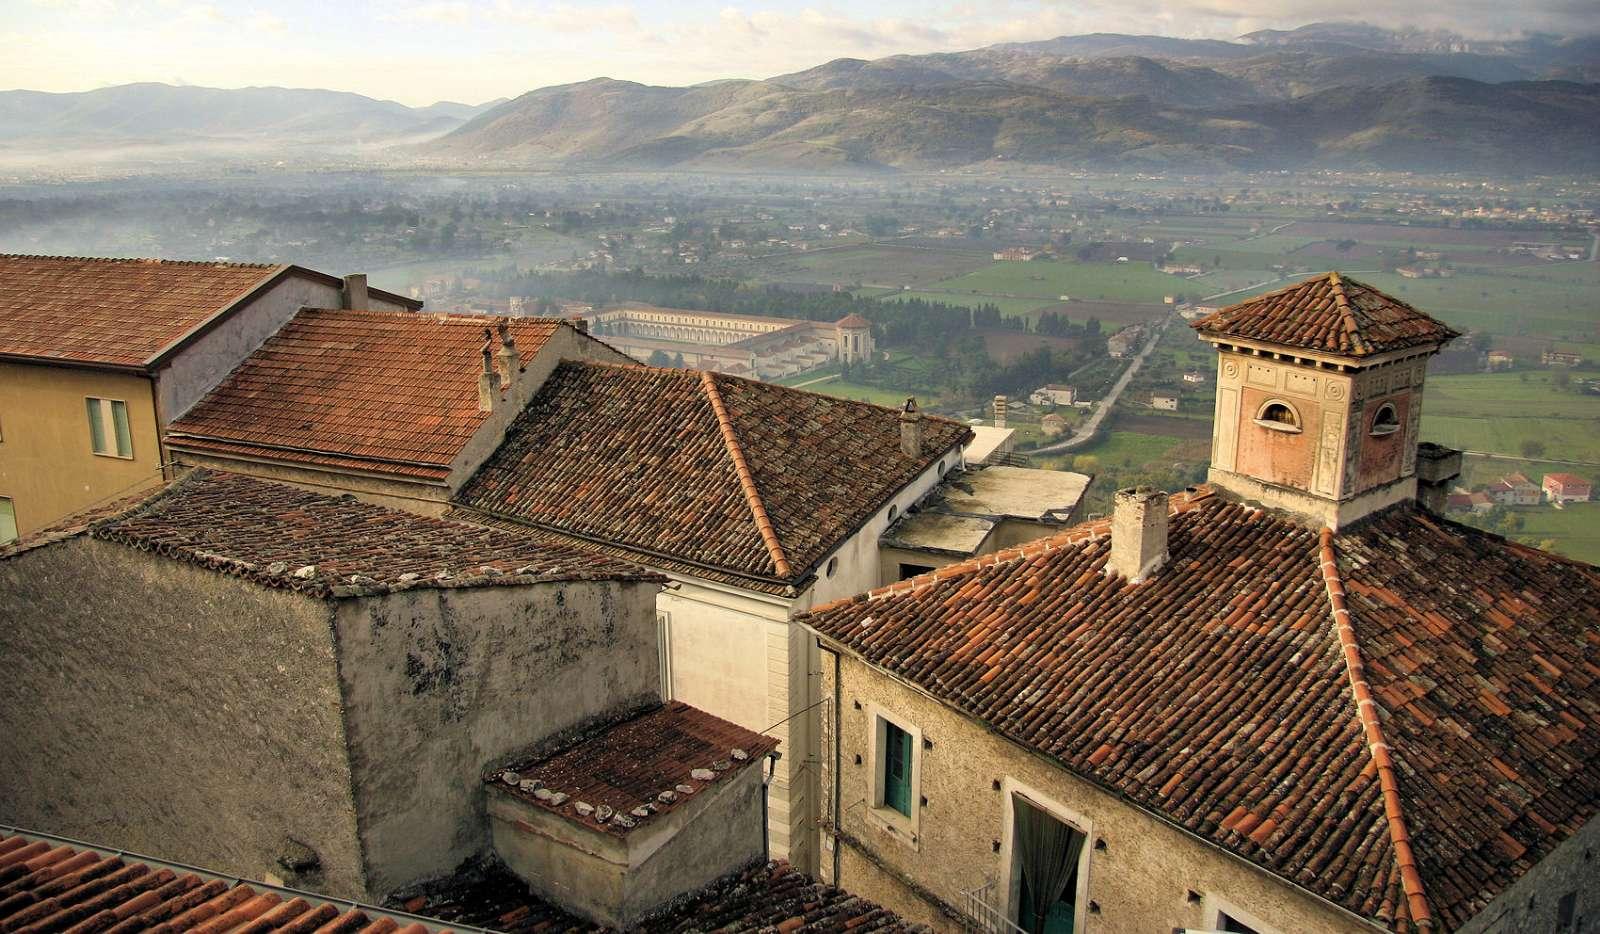 Udsigt fra byen over Certosa di San Lorenzo og Vallo di Diano dalen